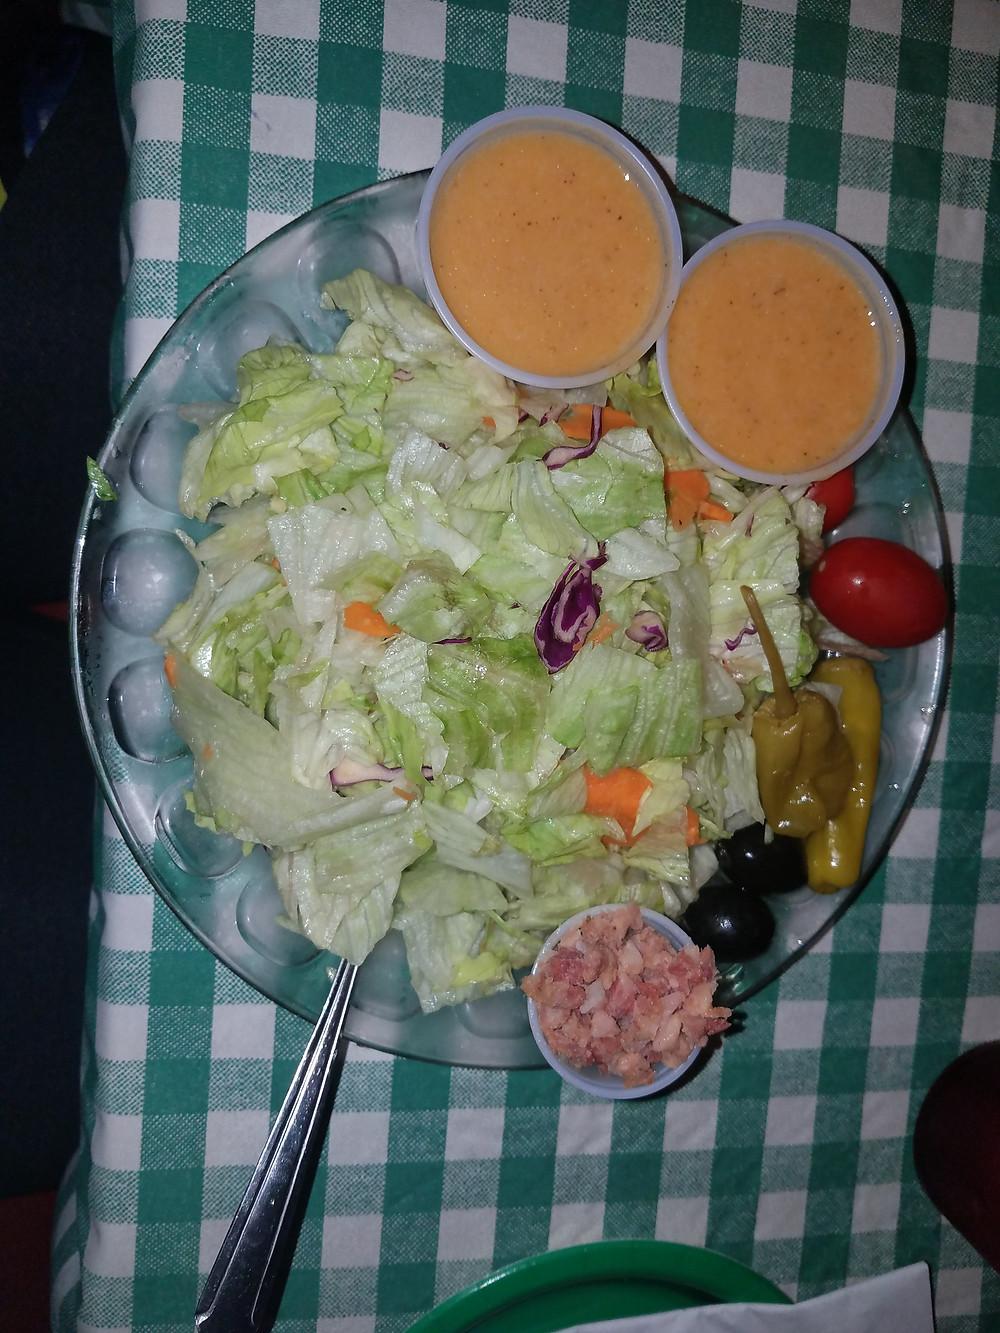 Salad w/ house made Italian dressing